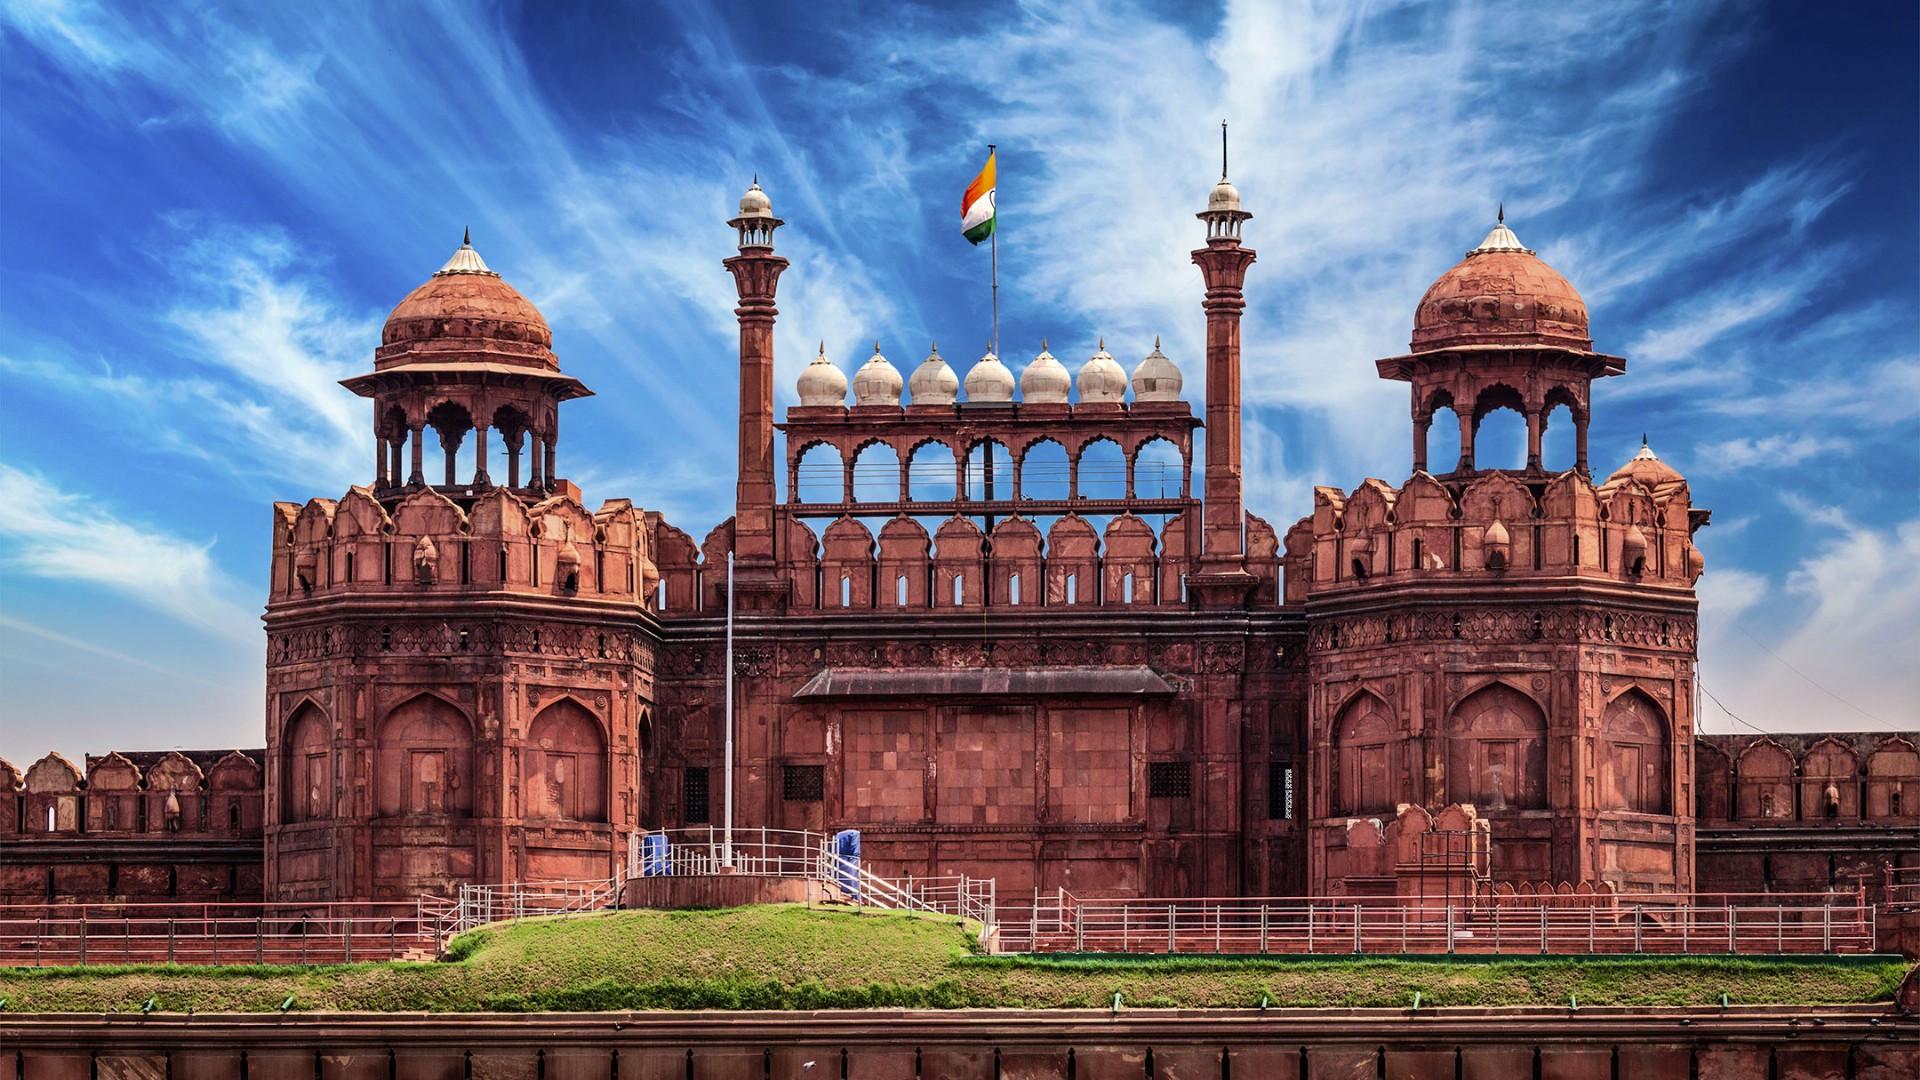 Dalmia Bharat adopts Red Fort